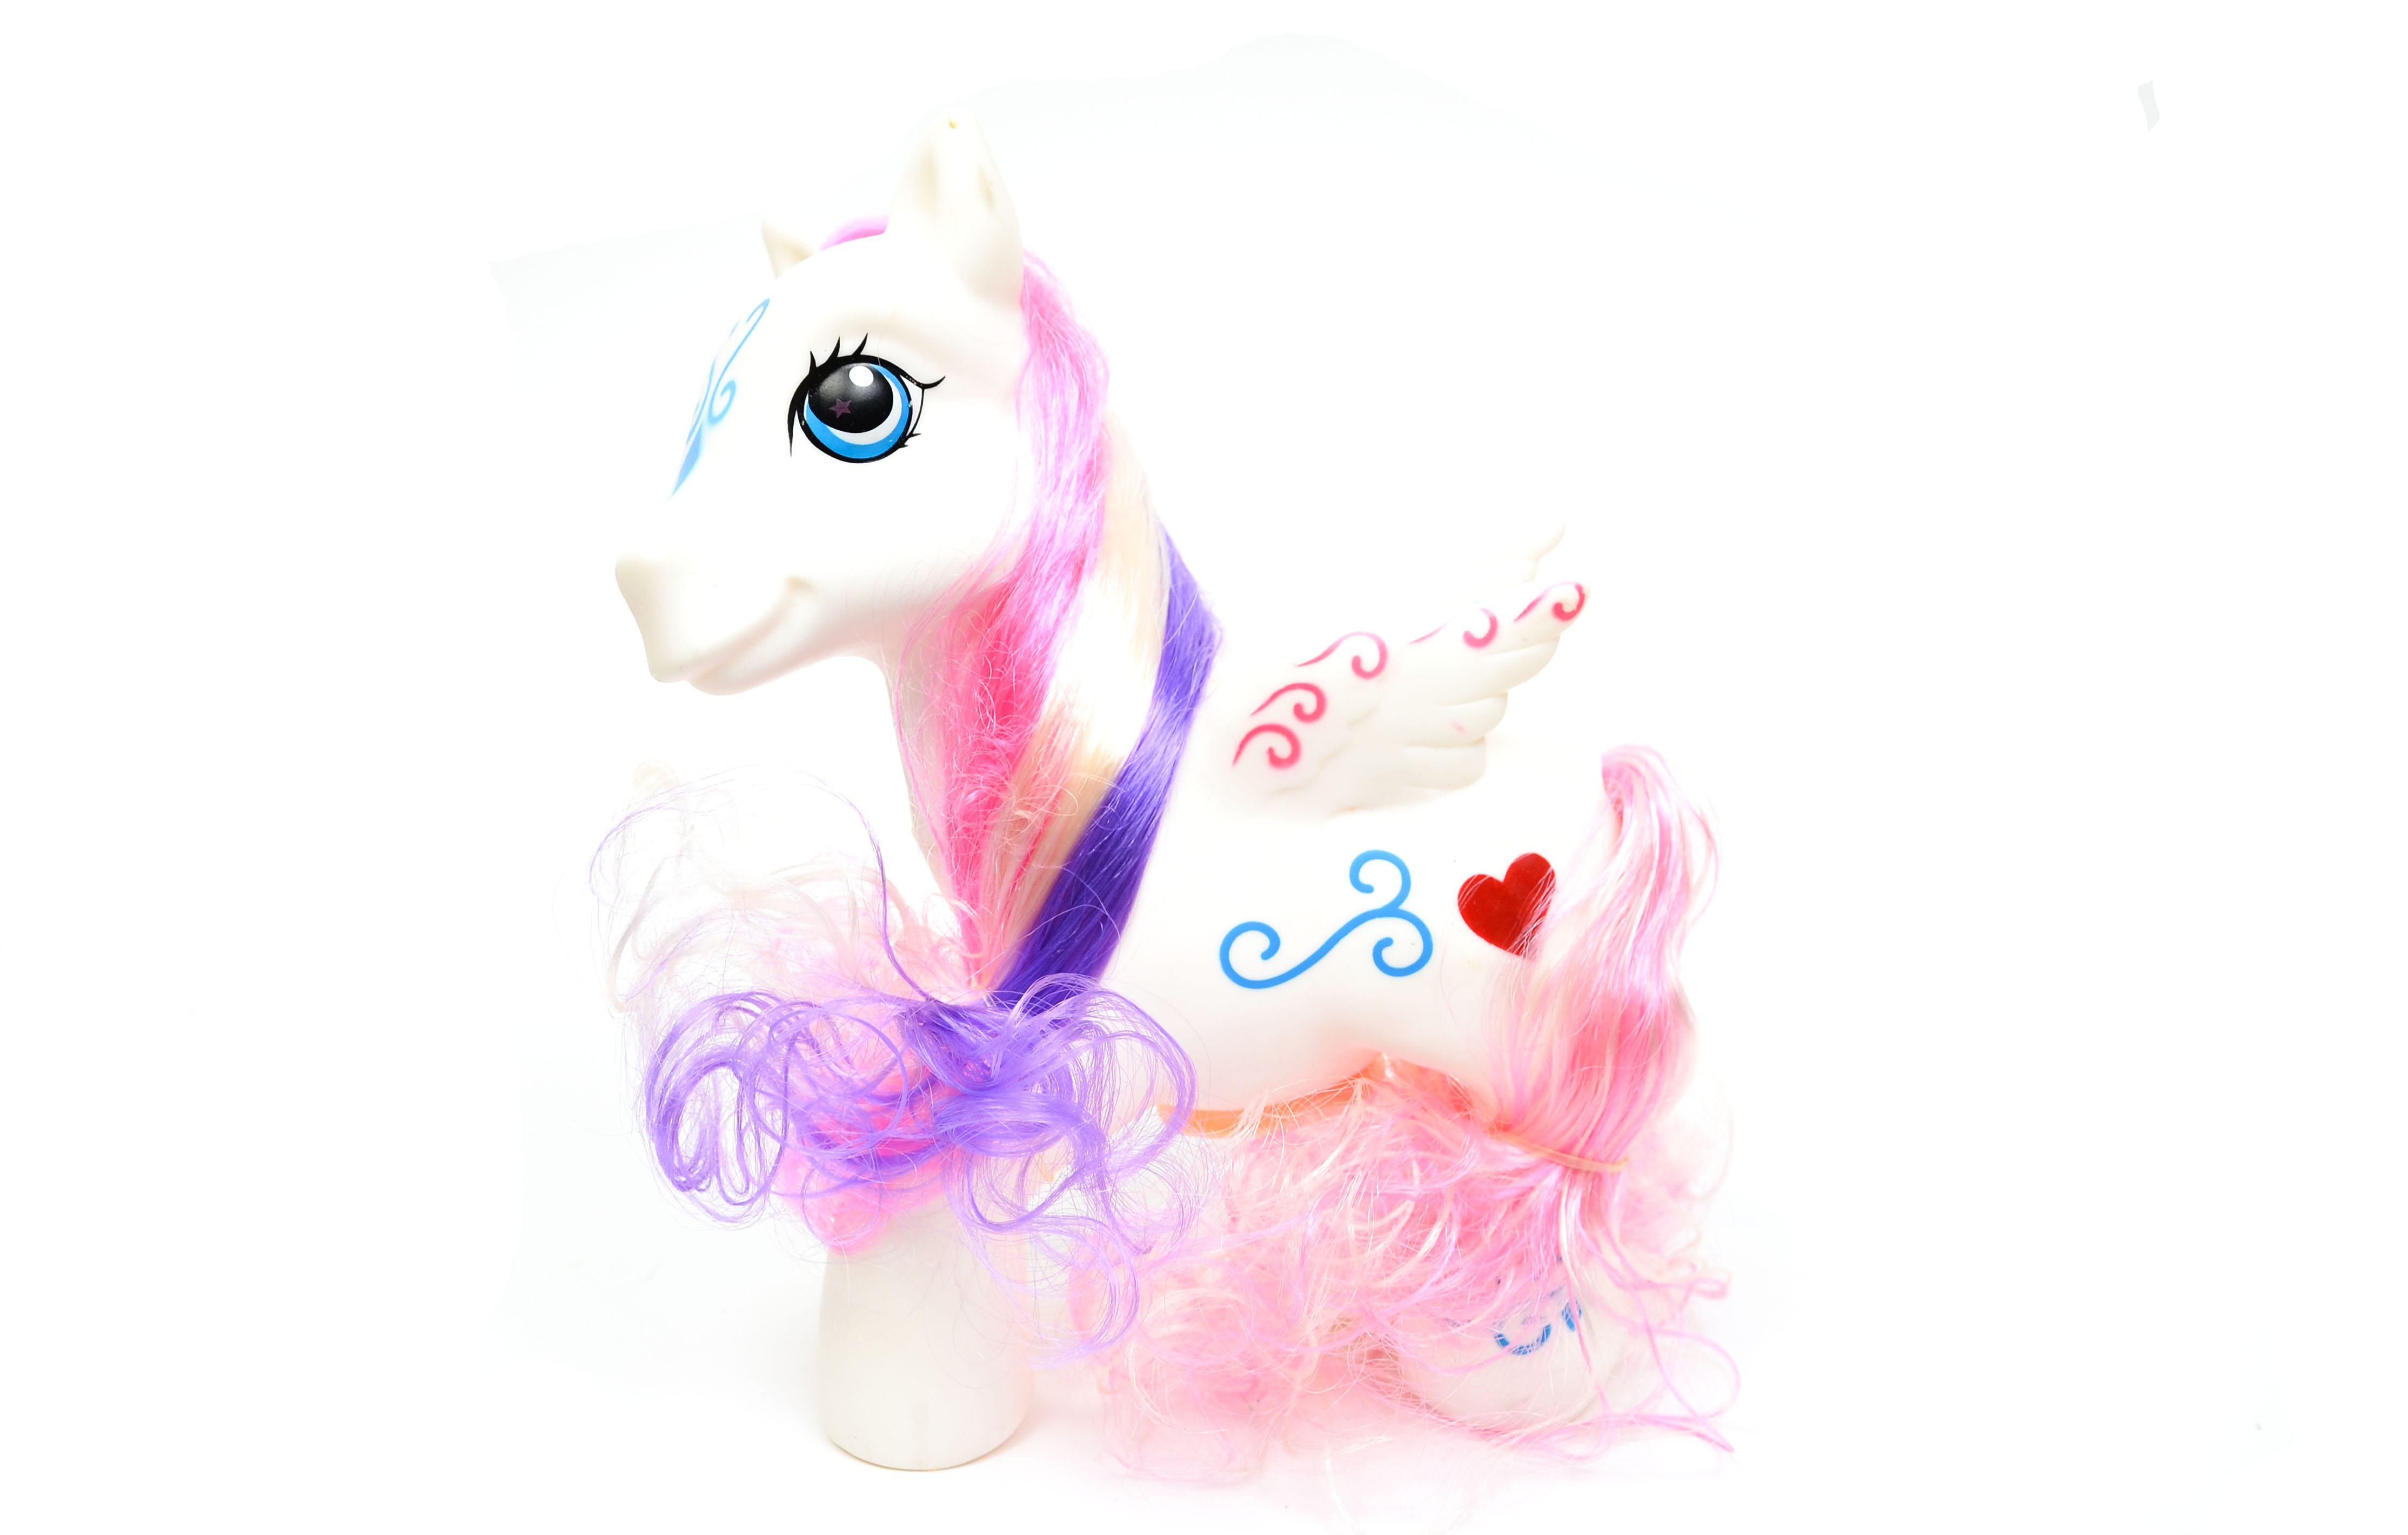 Jucarie Calut / Ponei alb pentru fetite - Lovely Horse 1251A